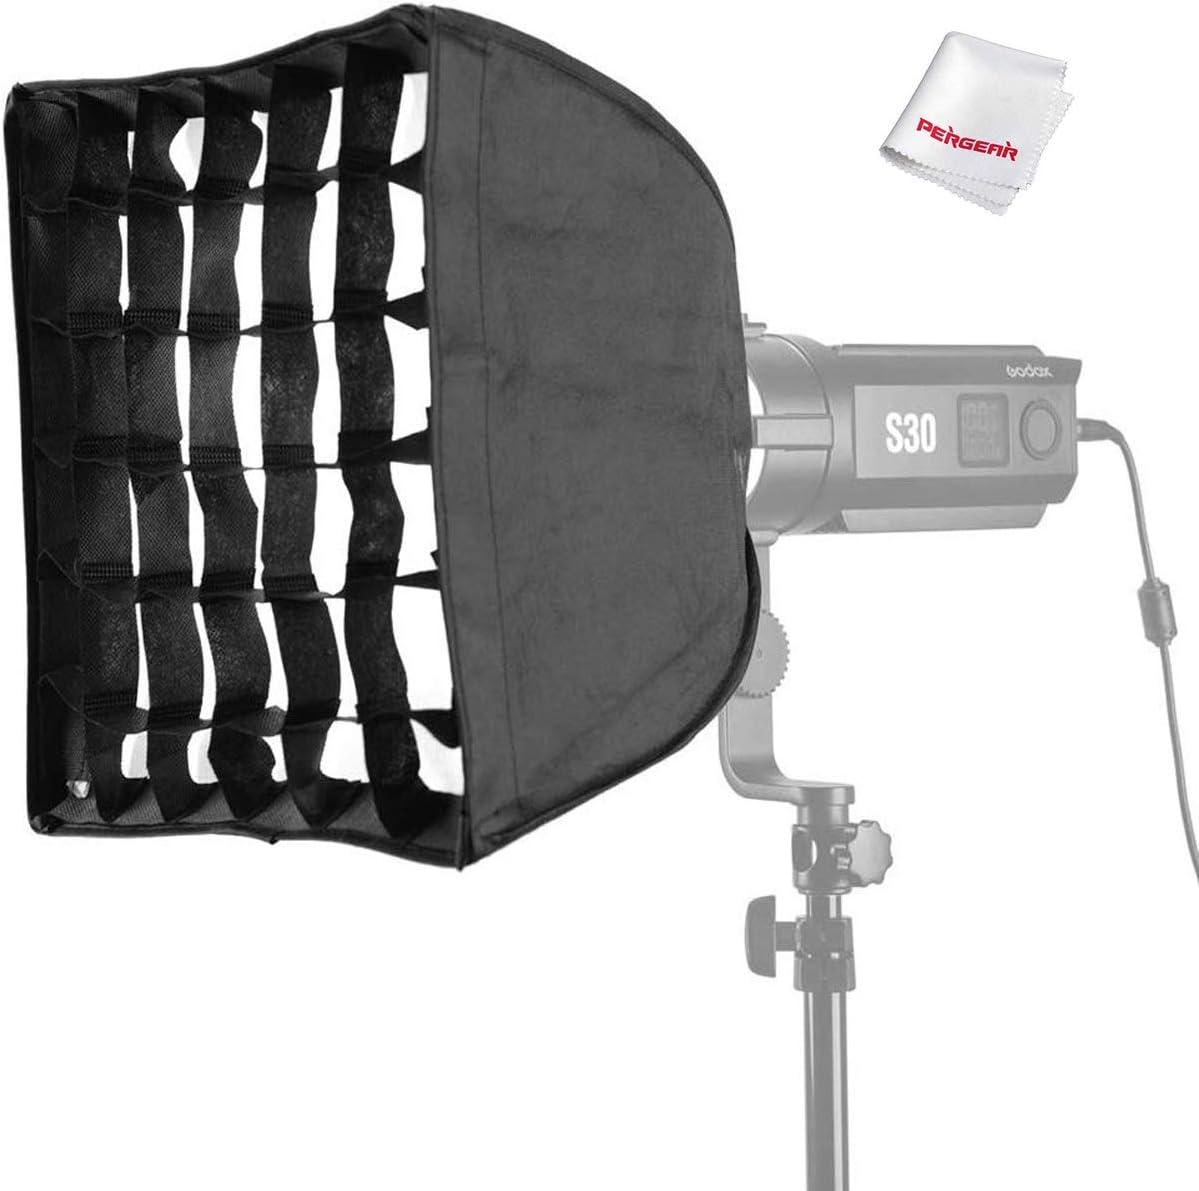 for Godox S30 Focusing LED Video Light W//Pergear Cloth Godox SA-30 Softbox with Grid 30cmX30cm